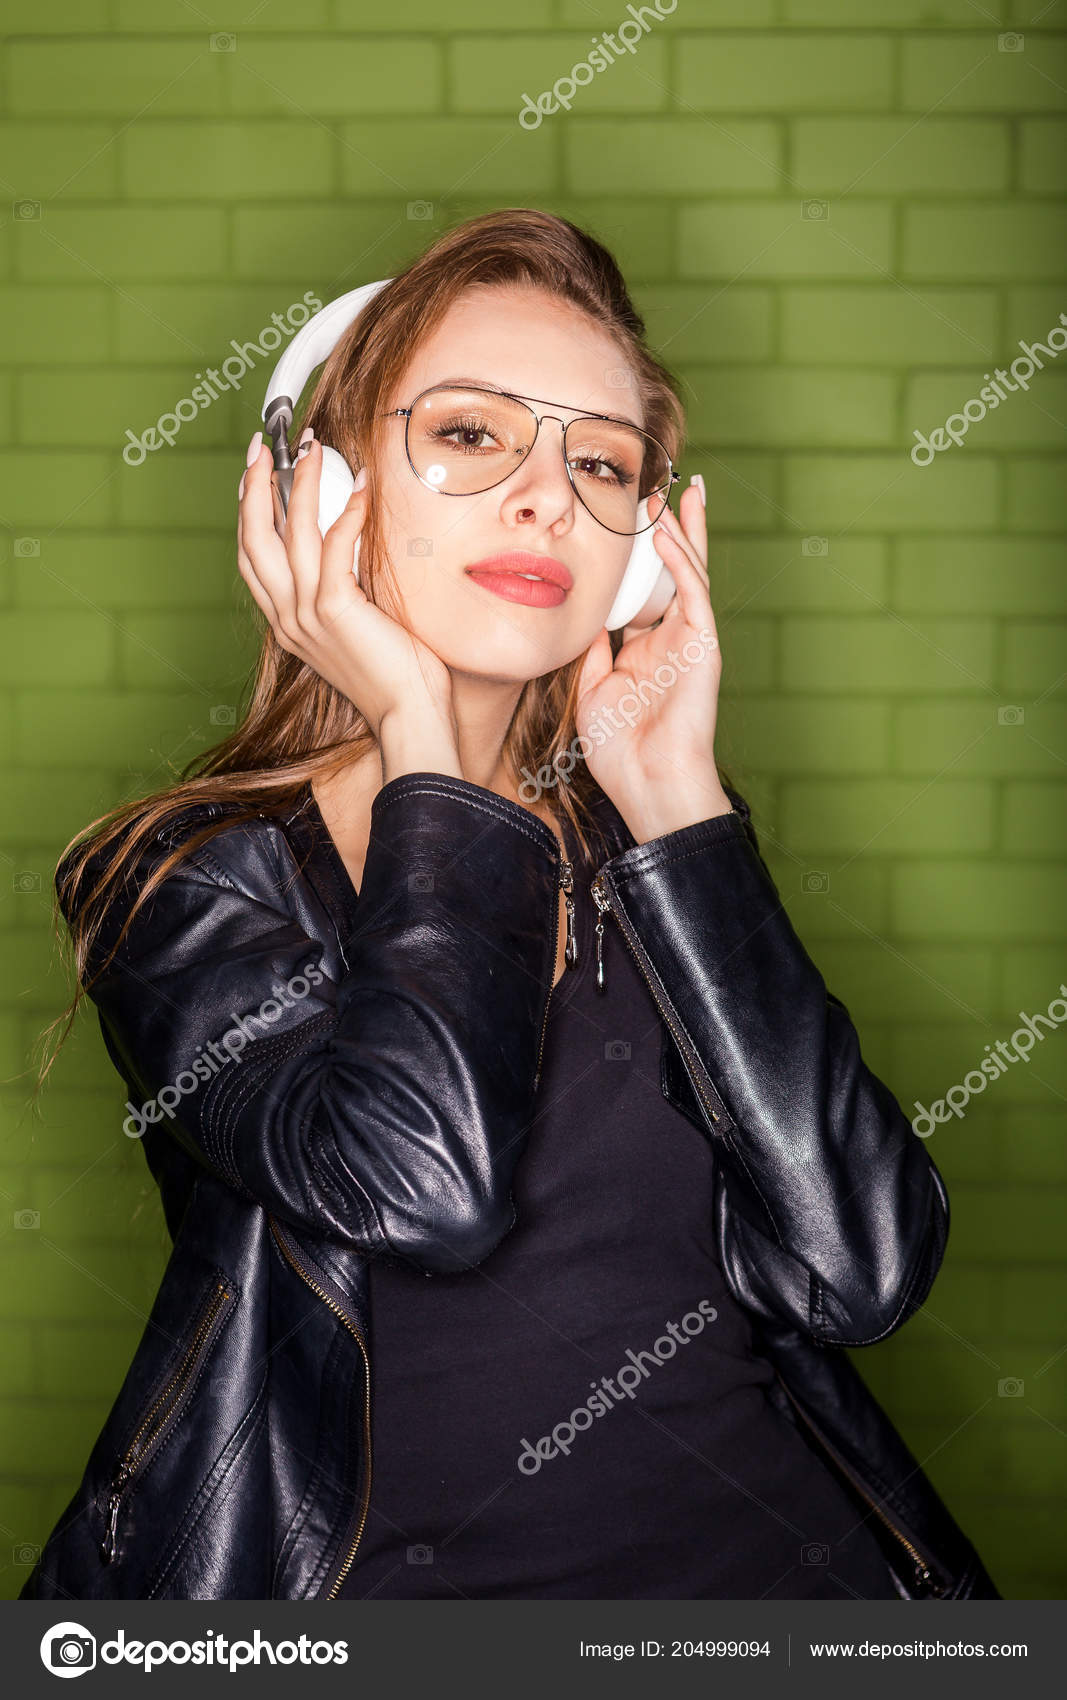 Negro Señora Hermosa Estilo Flash Gafas Moda Cuero Retrato qYxnw4TBET